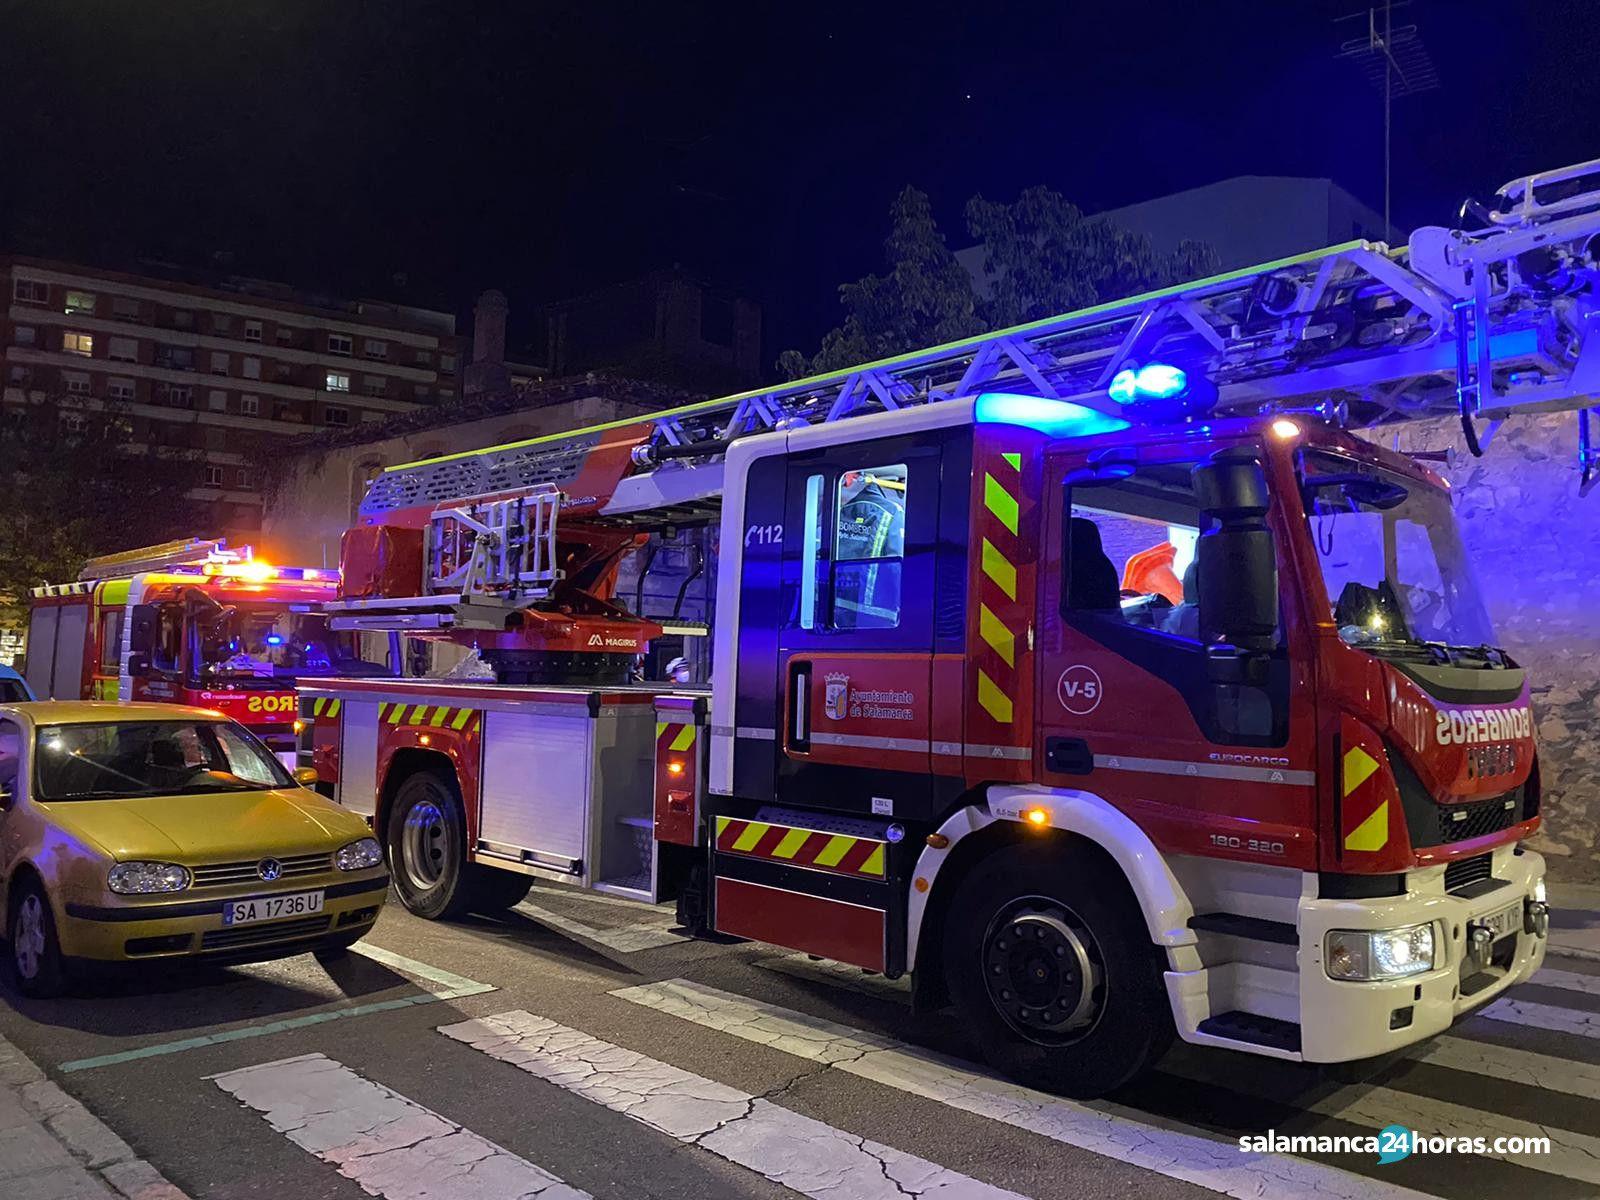 Incendio en el Palacete de Paseo de la Estacio?ncaf2f7fe 39b1 4438 a7dc a87c38d685be